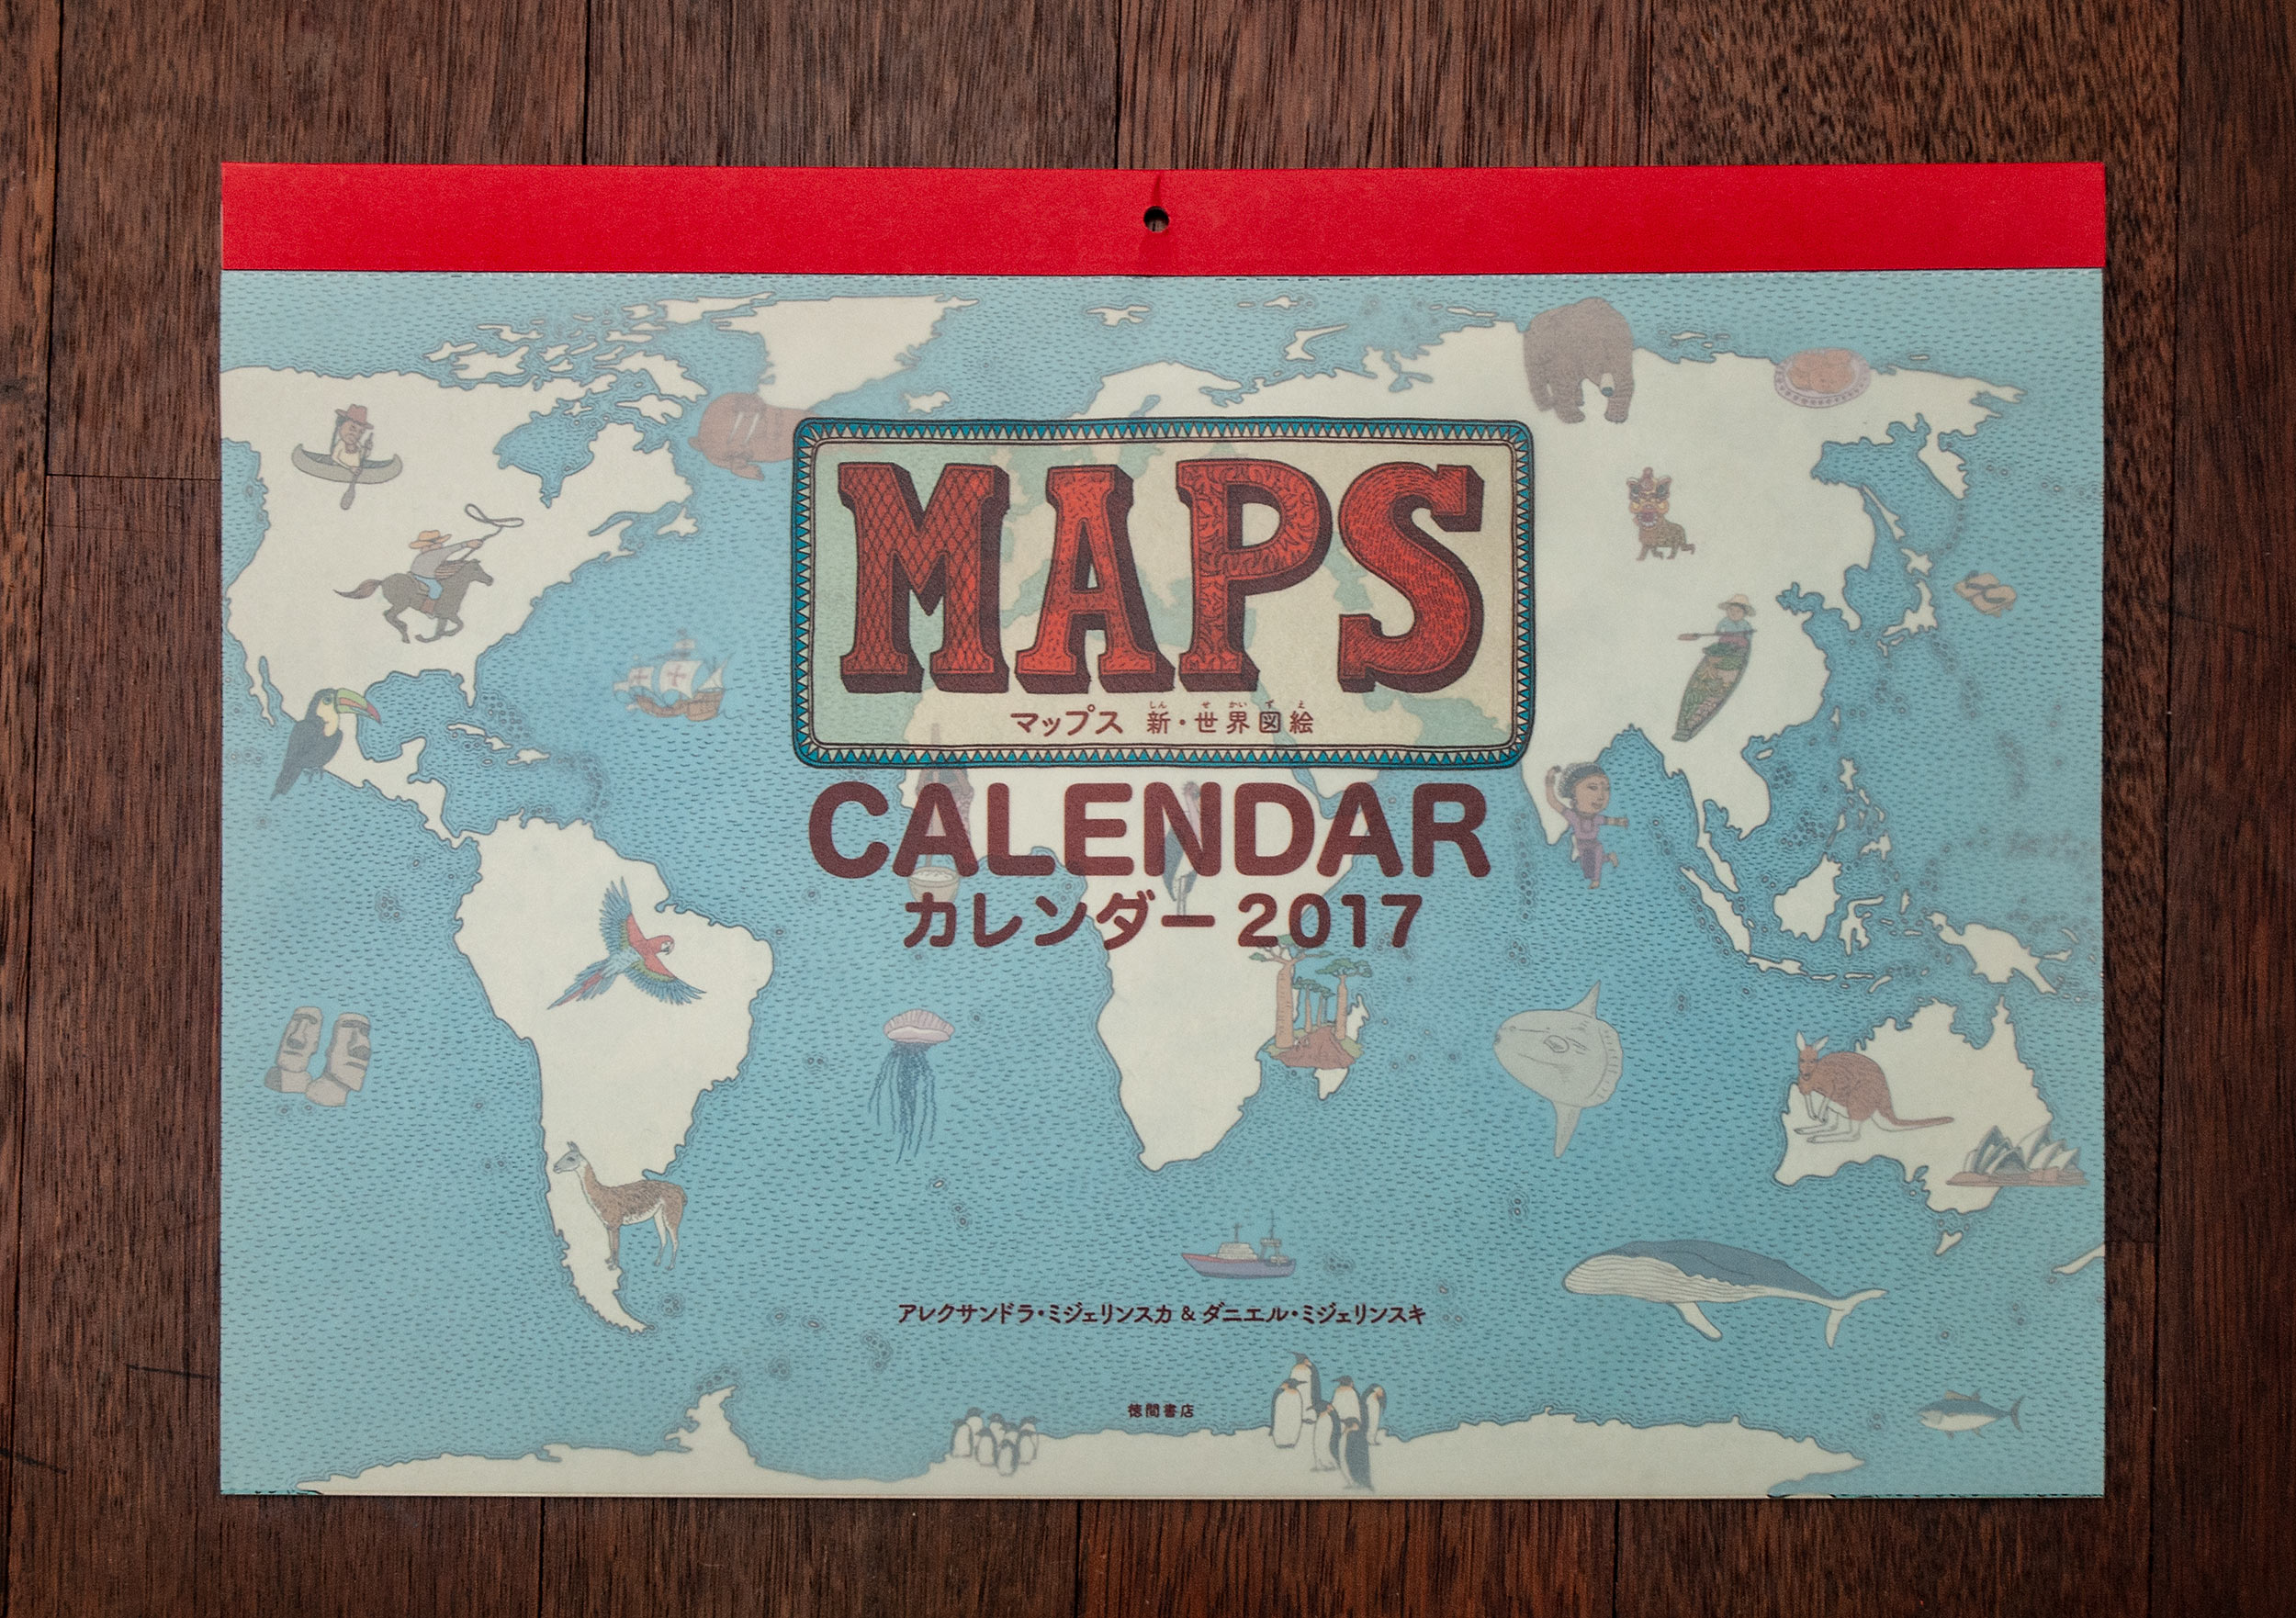 Japanese calendar for year 2017.